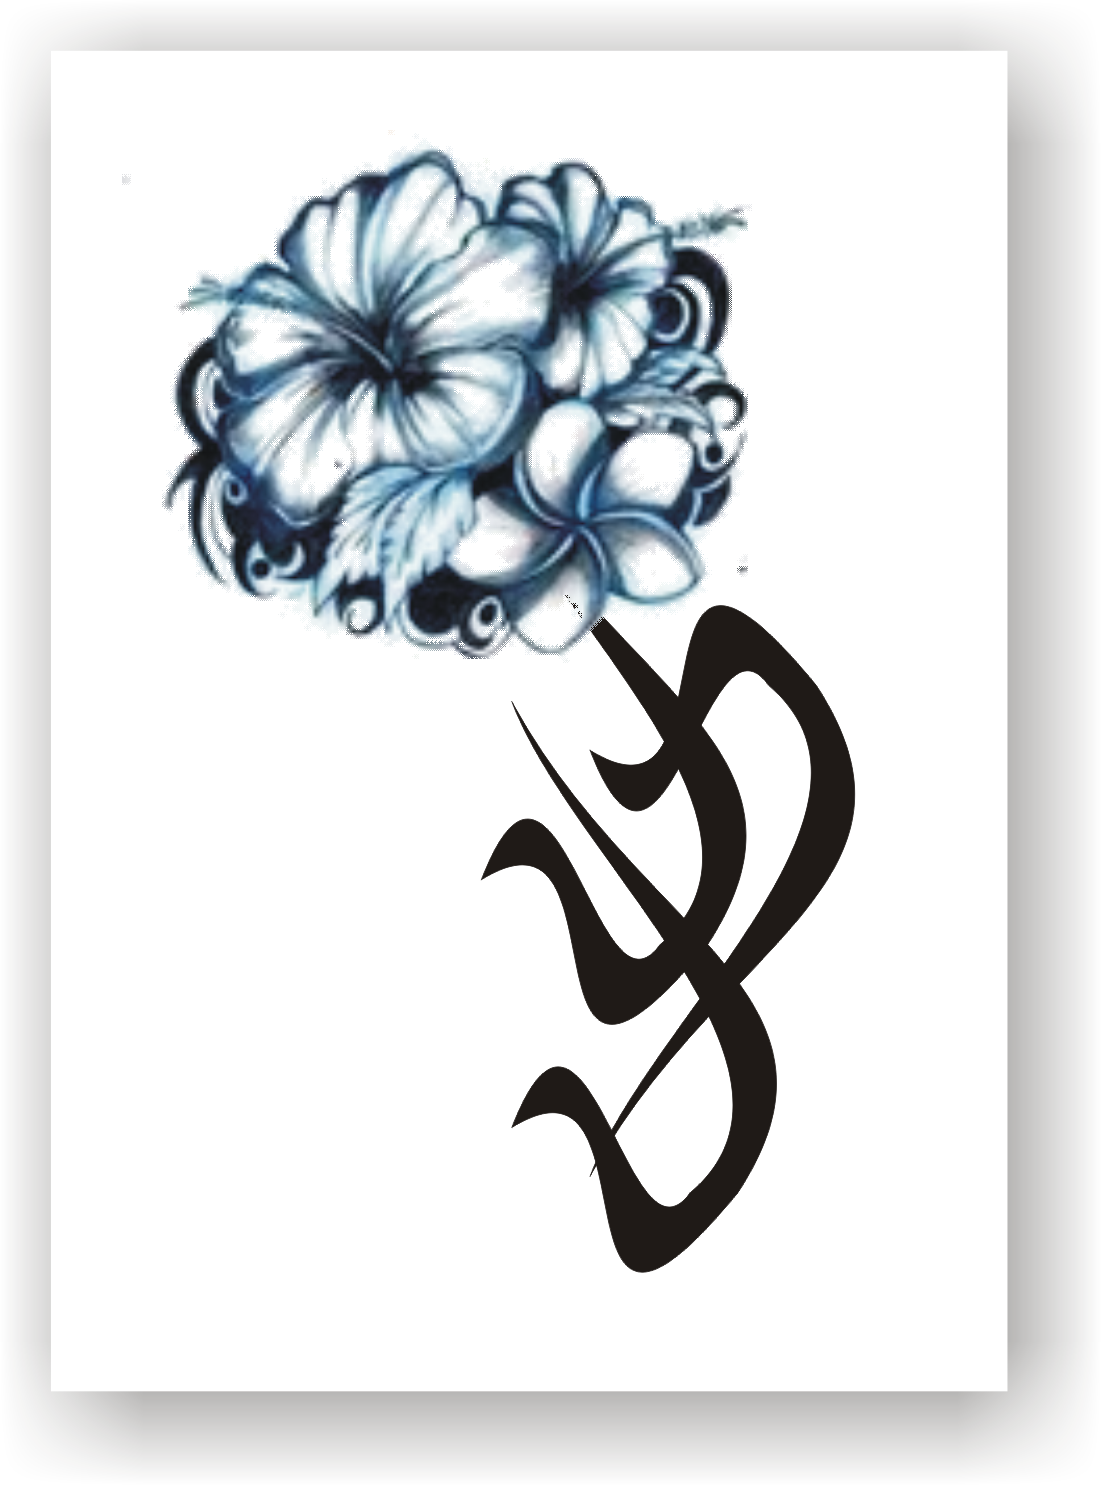 Hibiscus flower tattoo design izmirmasajfo